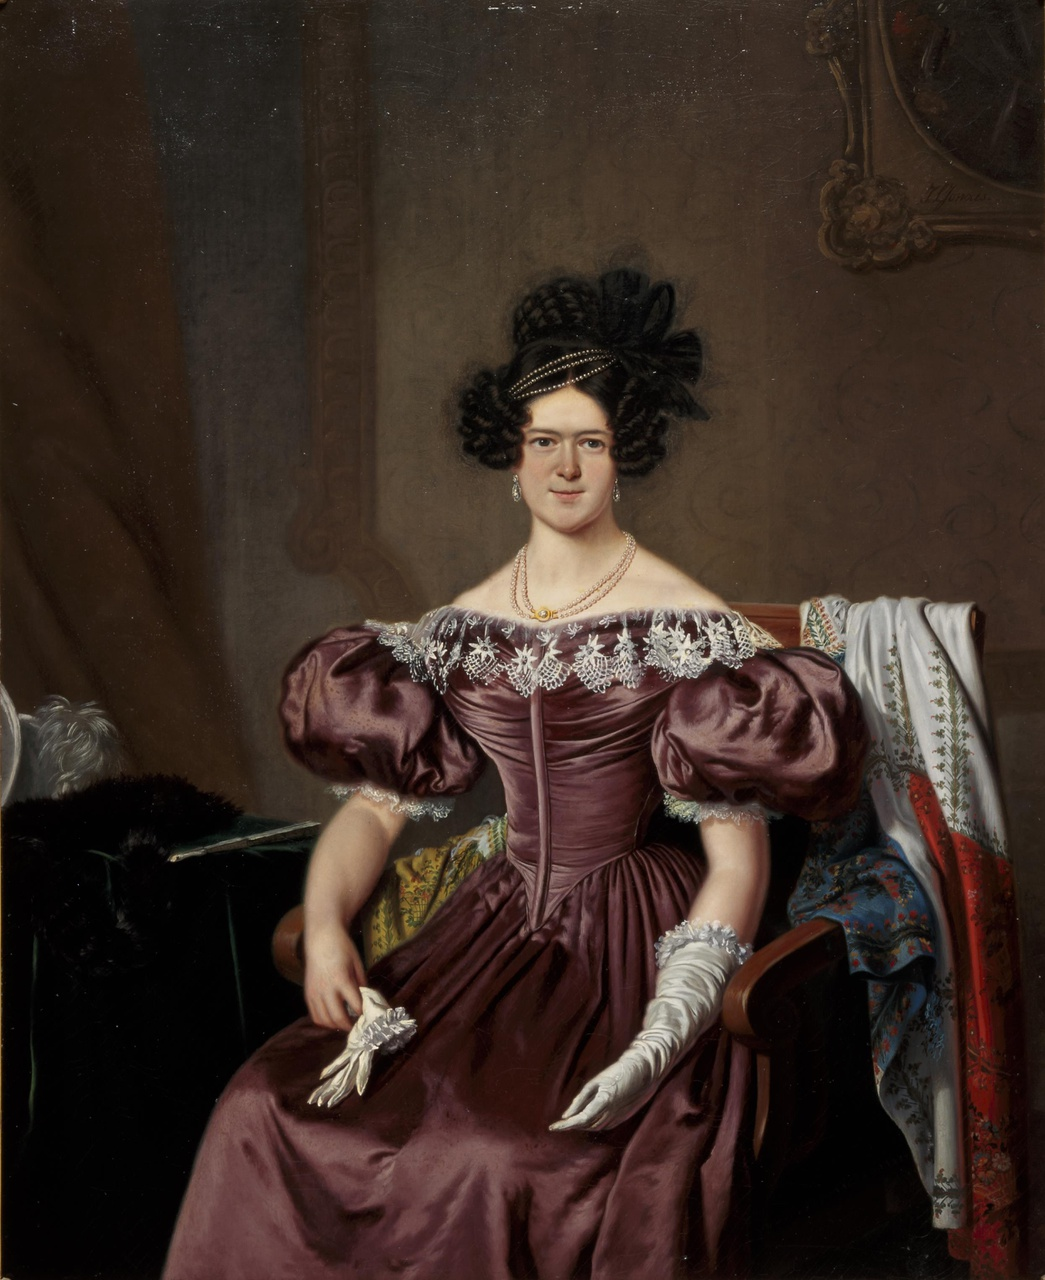 Portret van Susanna Jacoba Martens (1799-1860), echtgenote van Jacob Constantijn Martens van Sevenhoven